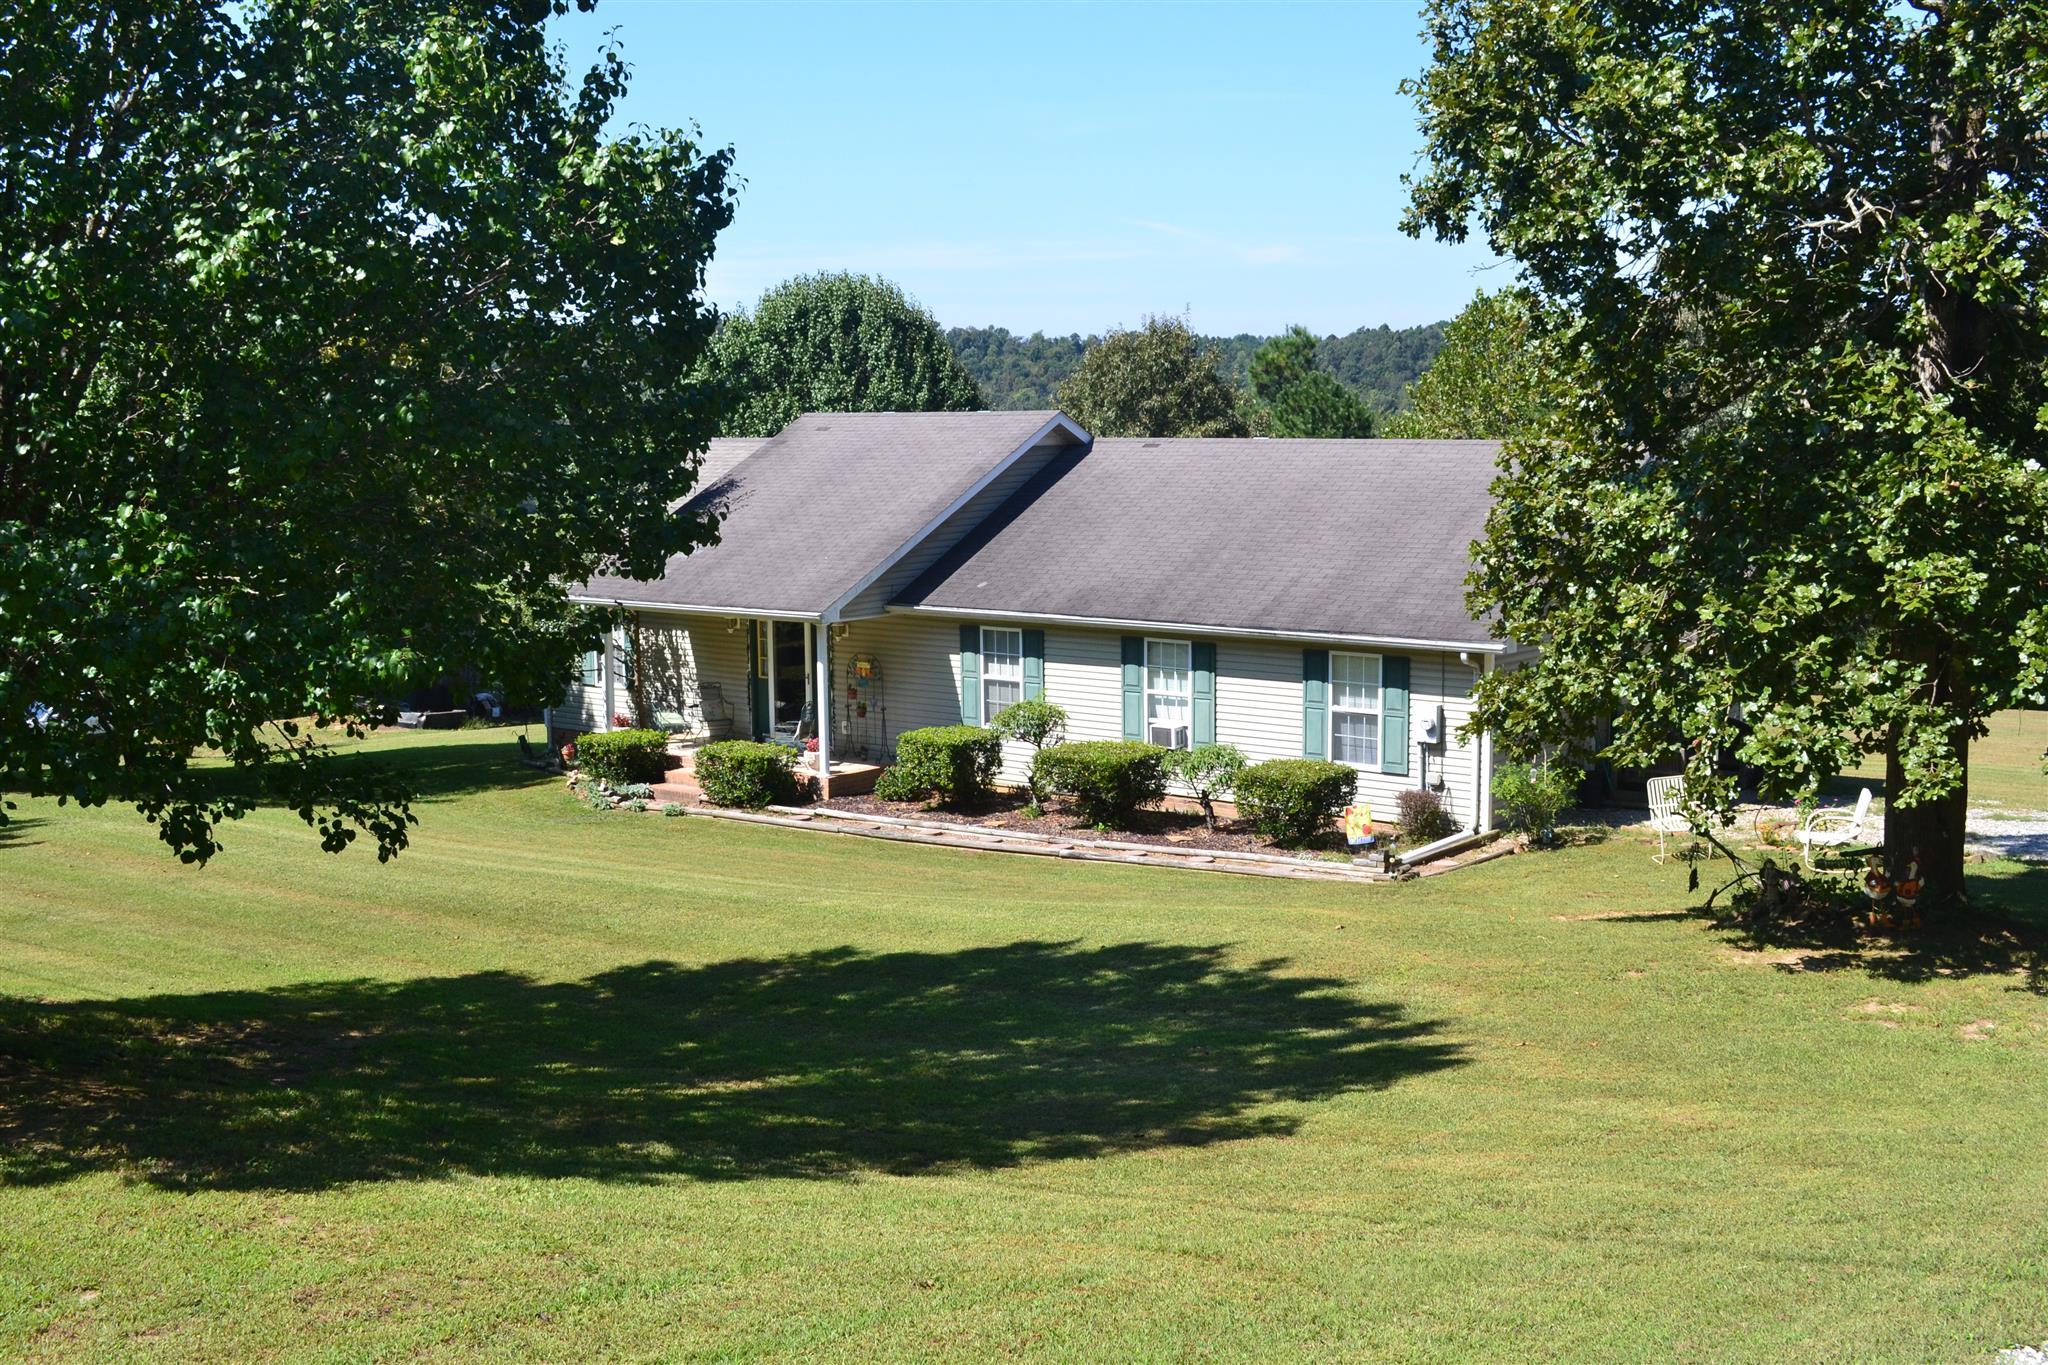 12530 Mt. Carmel Camp Creek Rd, Crofton, KY 42217